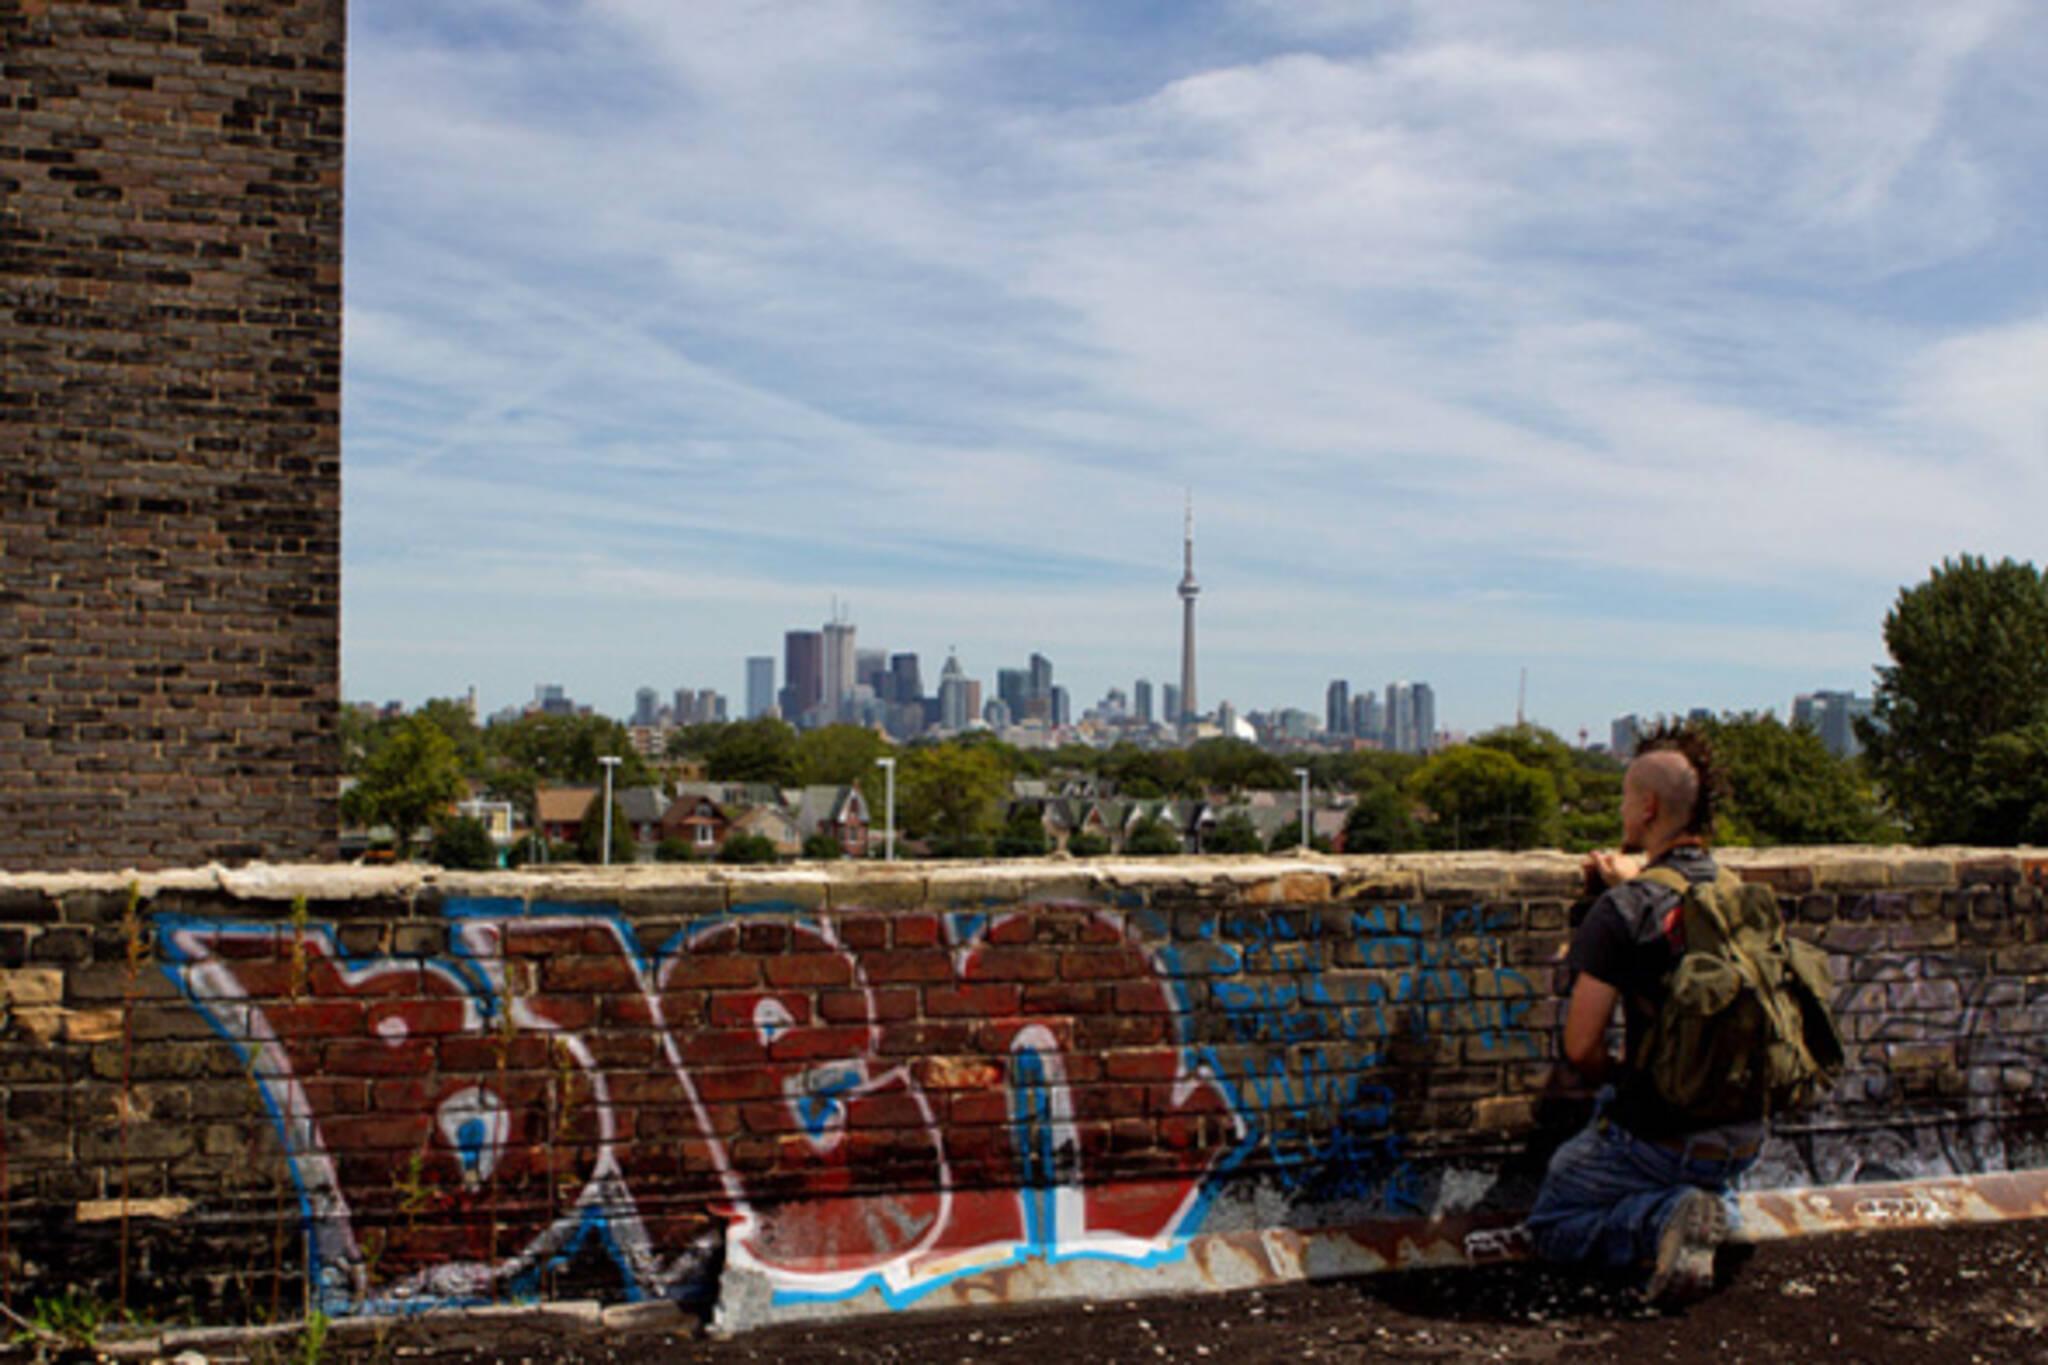 Toronto lookout